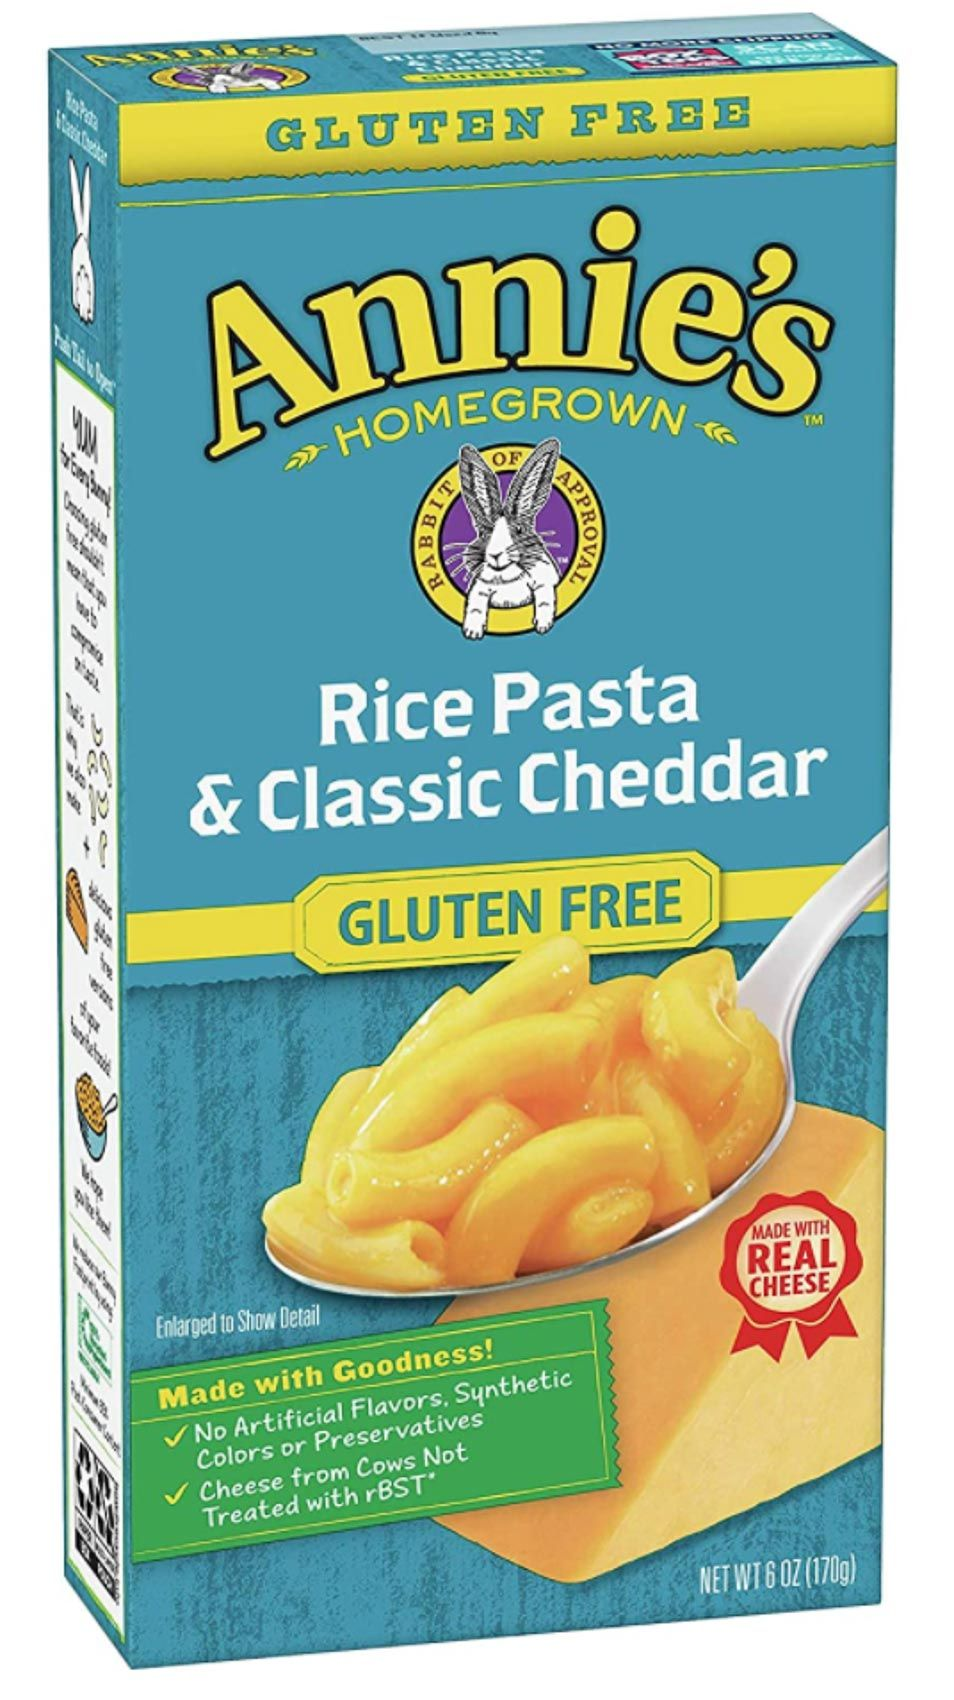 annies_gluten_free_rice_pasta_classic_cheddar_macaronia_cheese.jpg